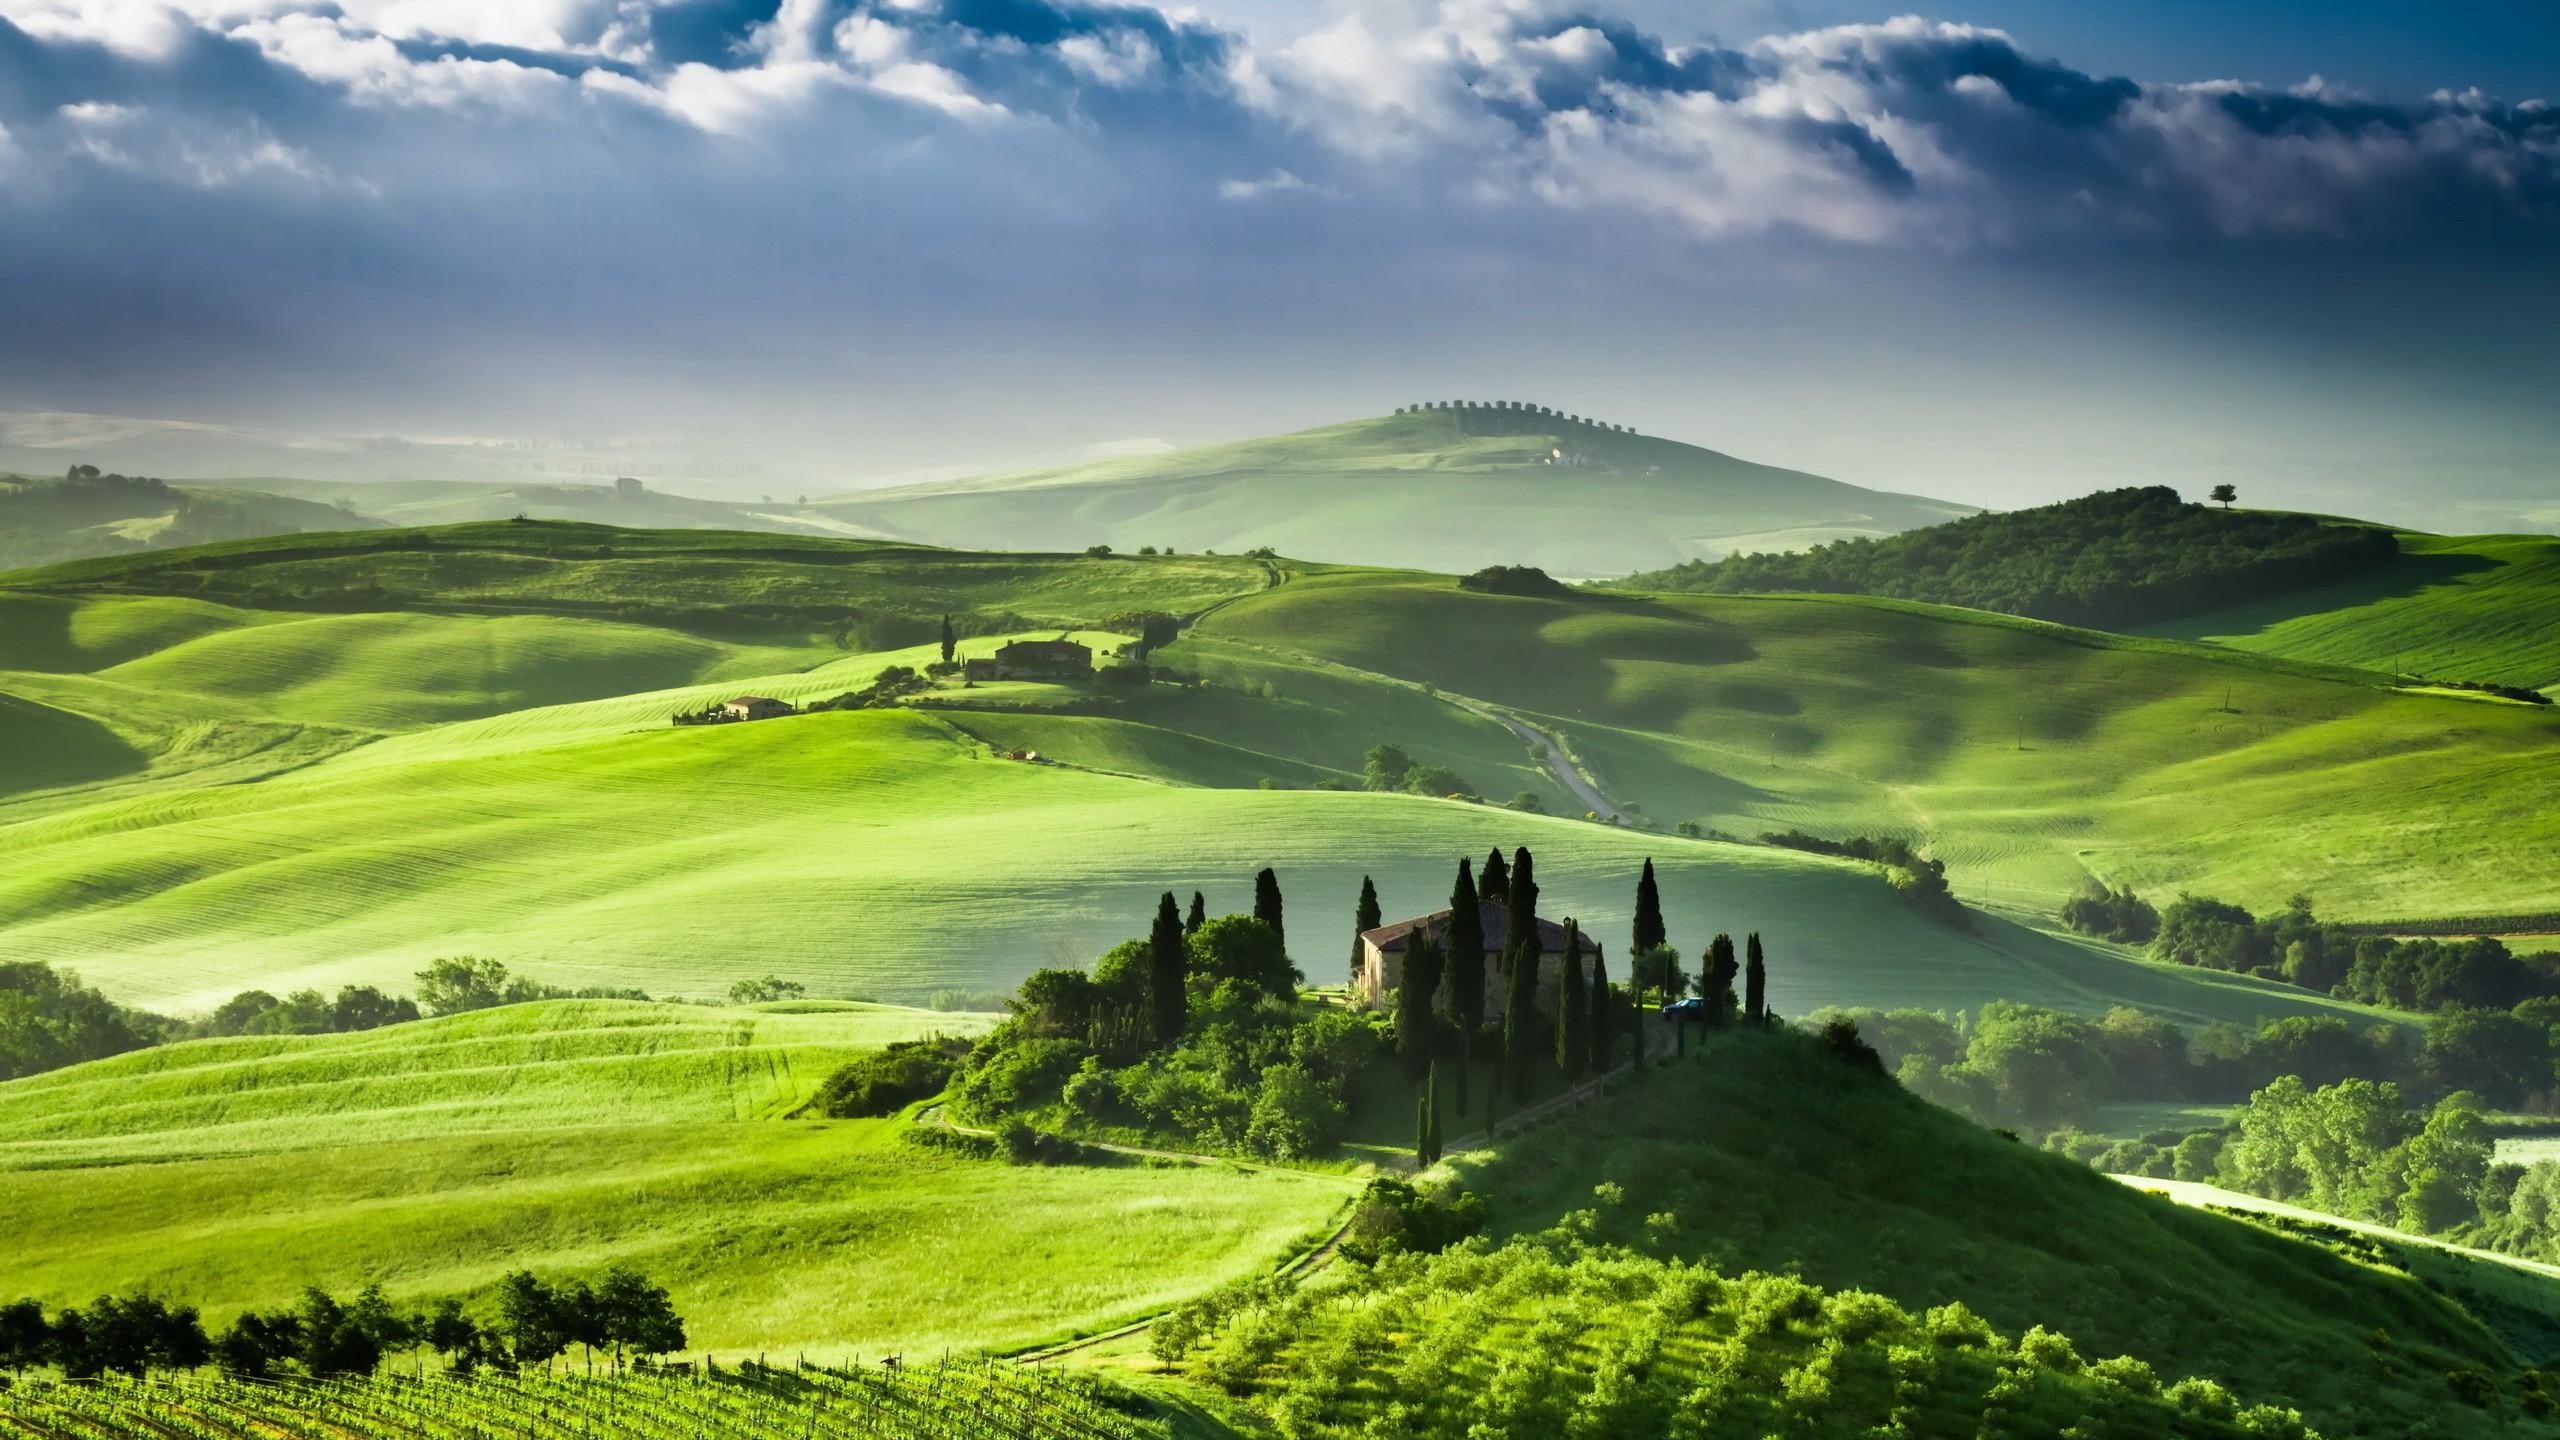 Tuscany - Desktop Wallpaper